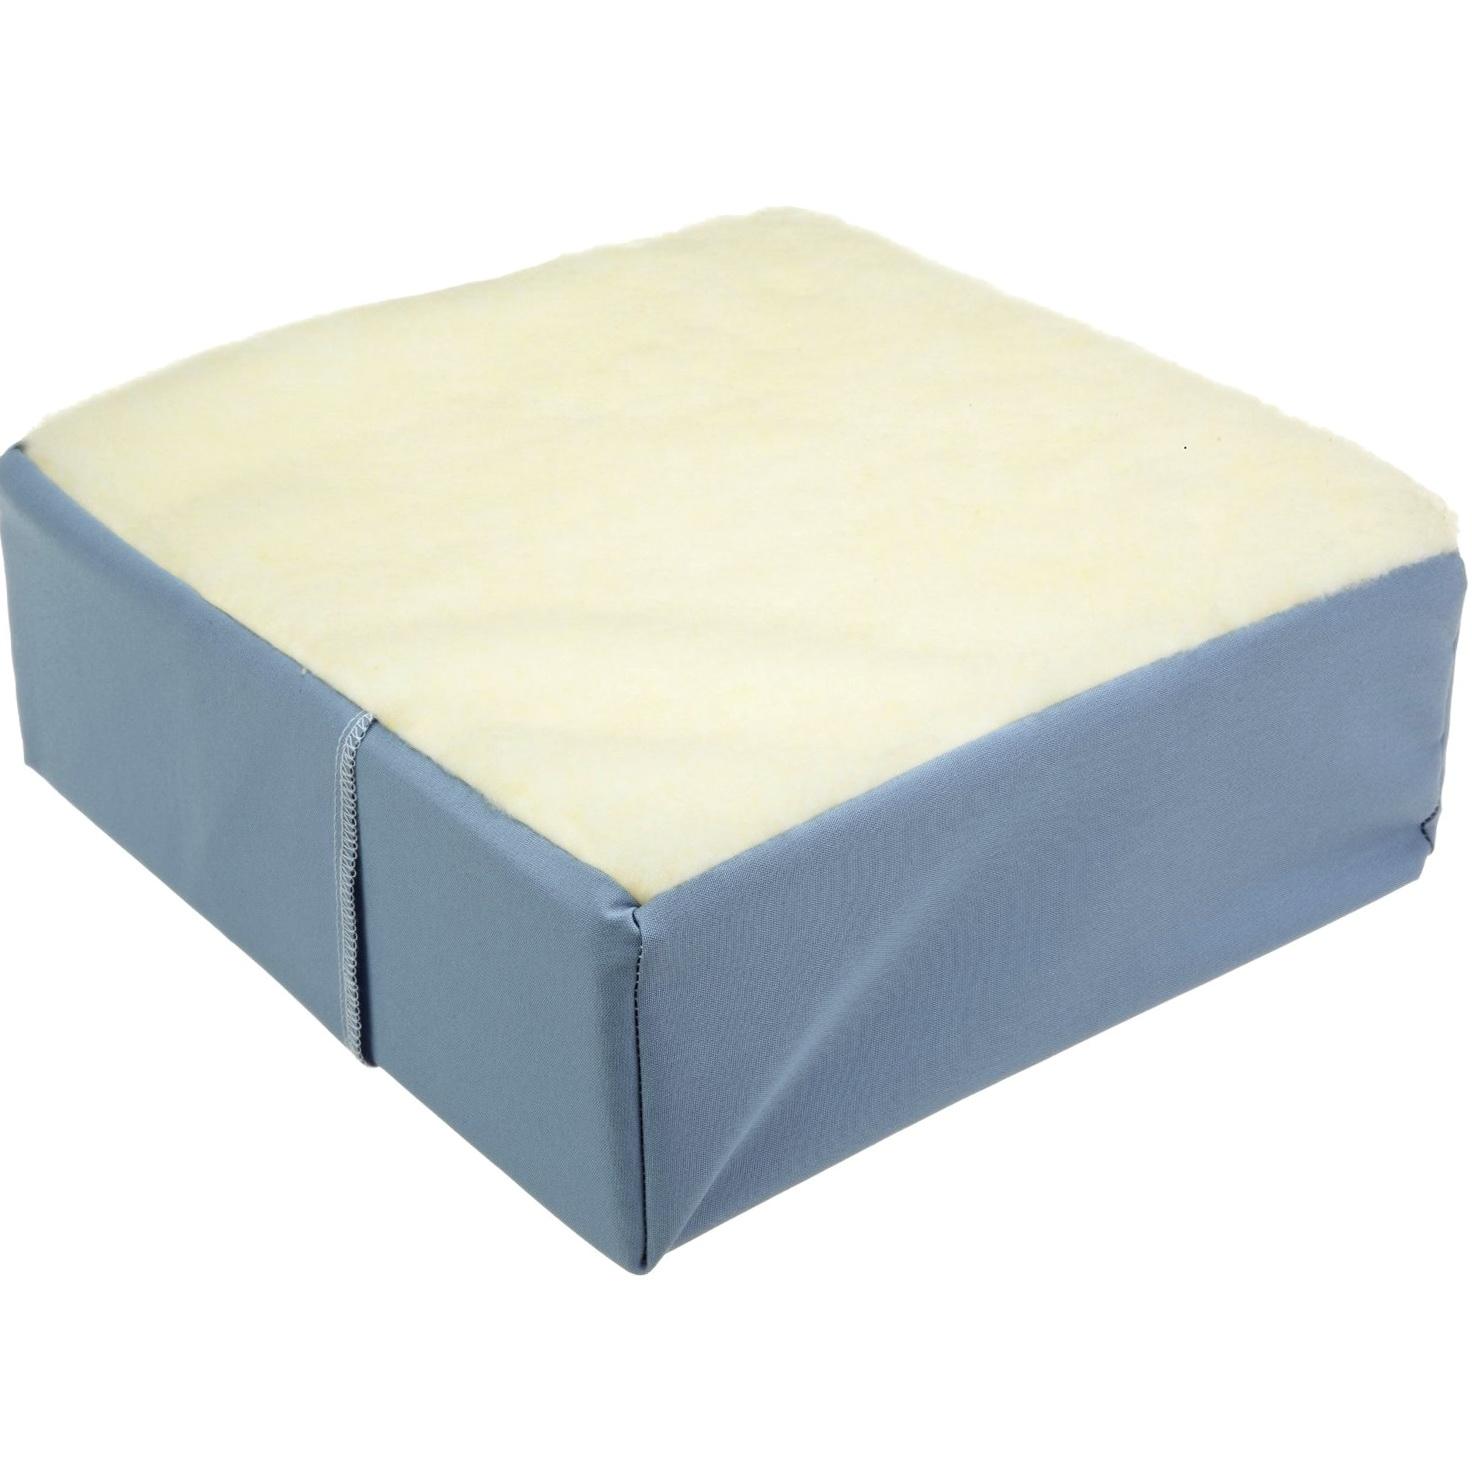 Where To Buy Cushion Foam Toronto